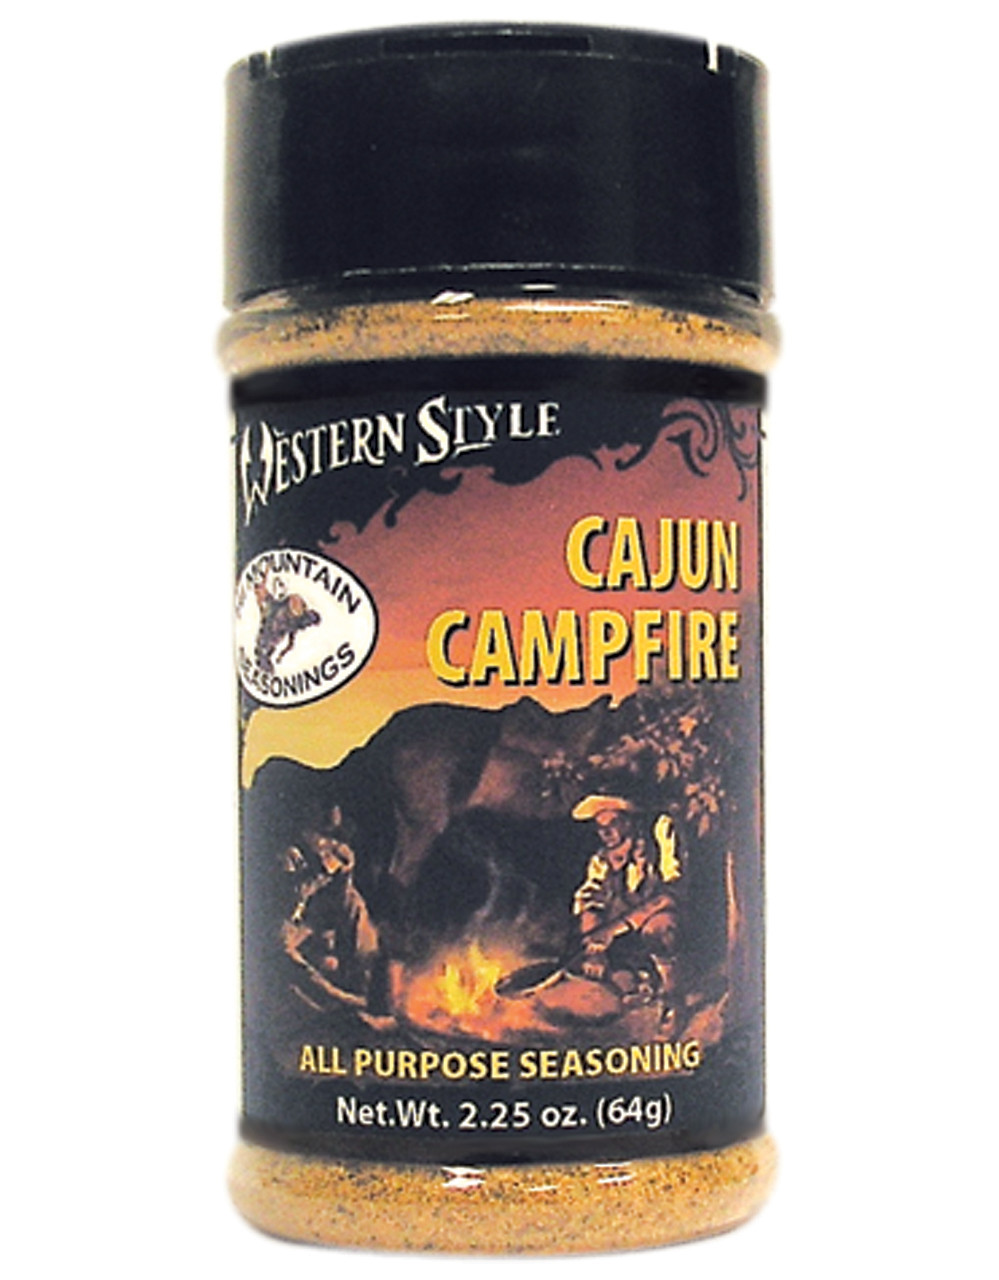 Cajun Campfire Western Style Seasoning